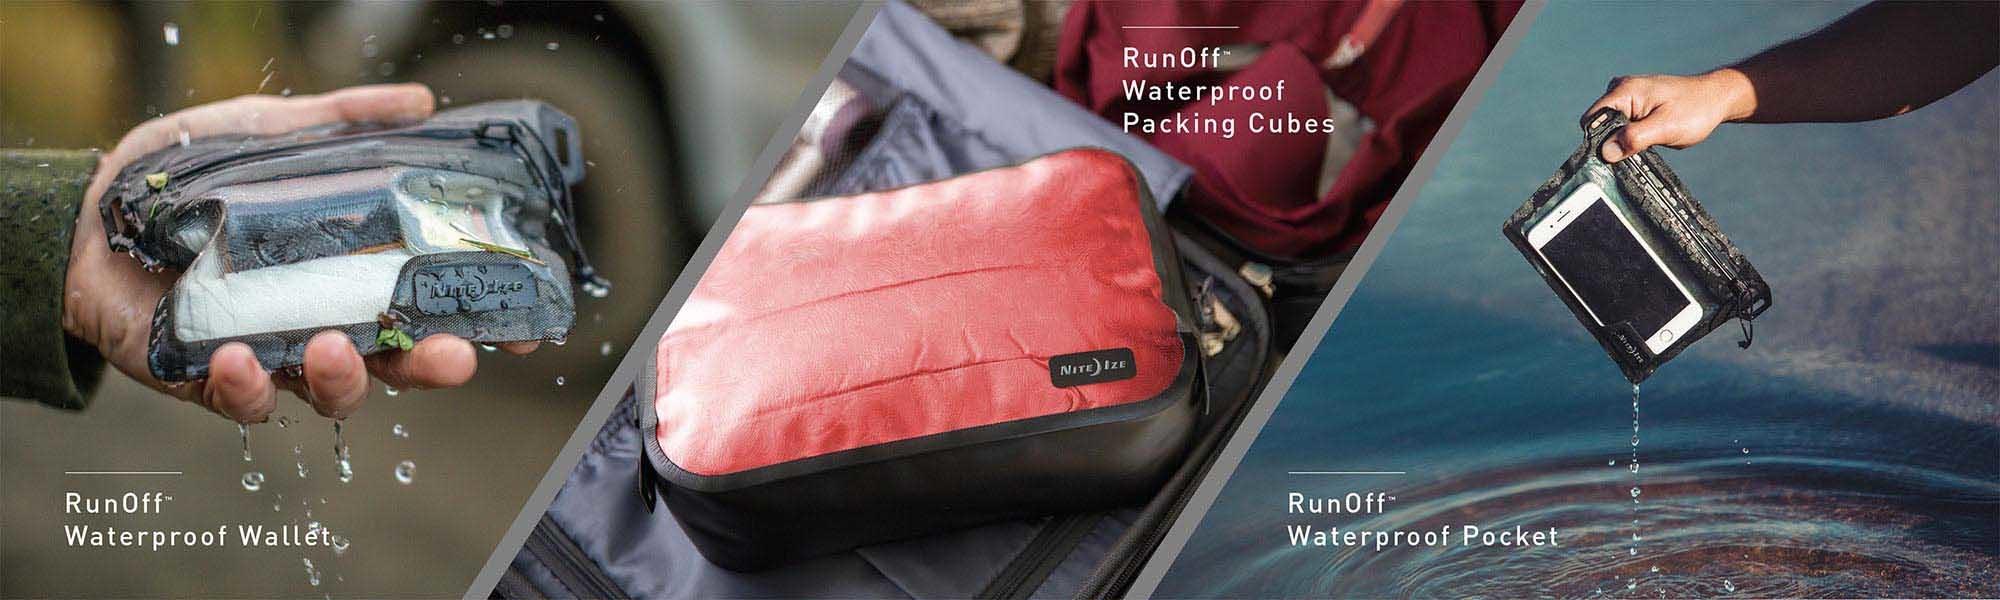 niteize, pouch, bag, waterproof